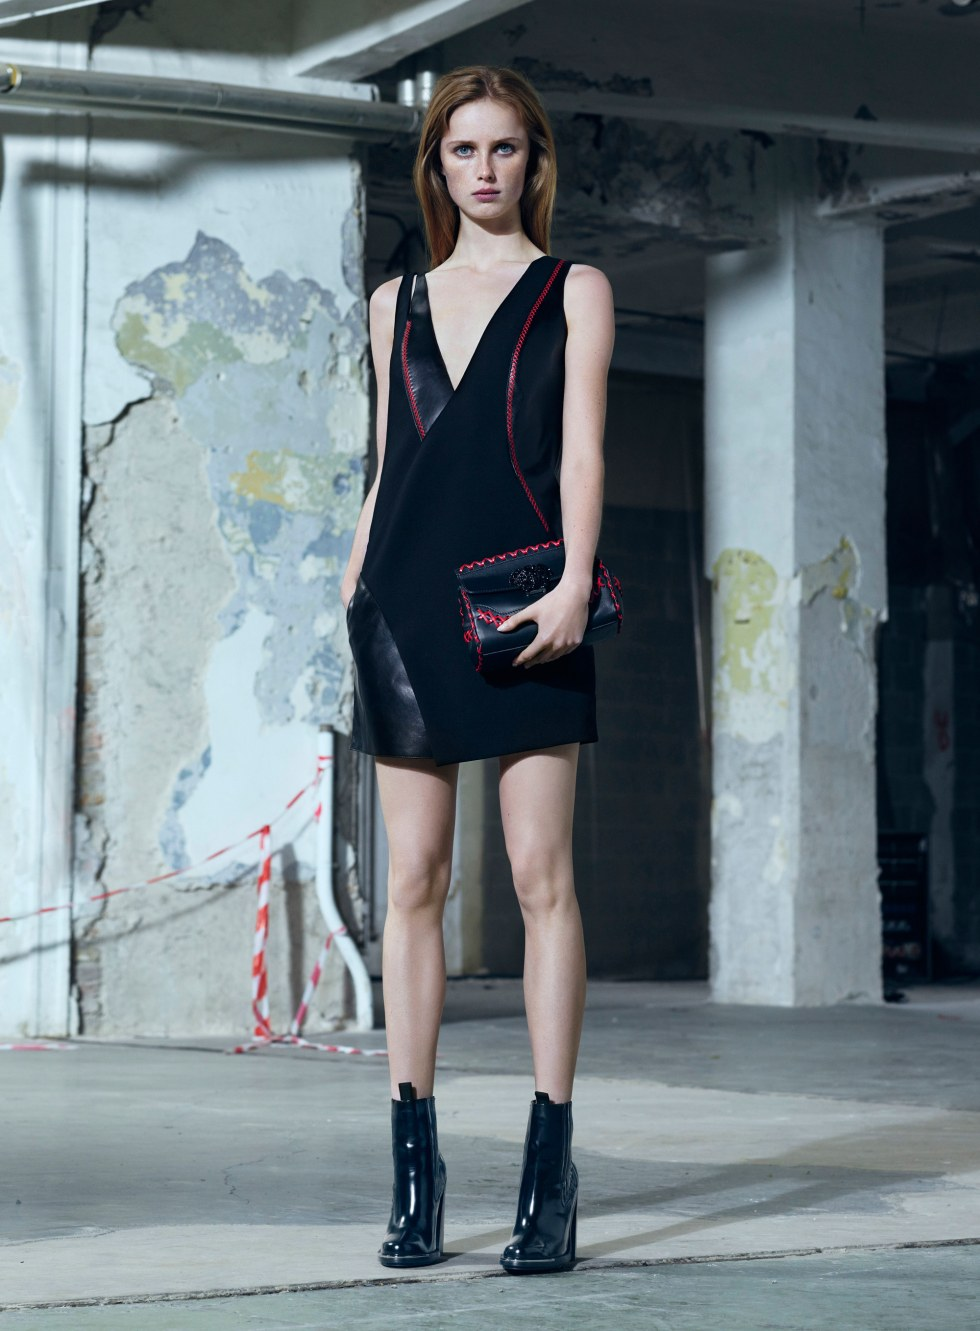 versace-pre-fall-2016-lookbook-23